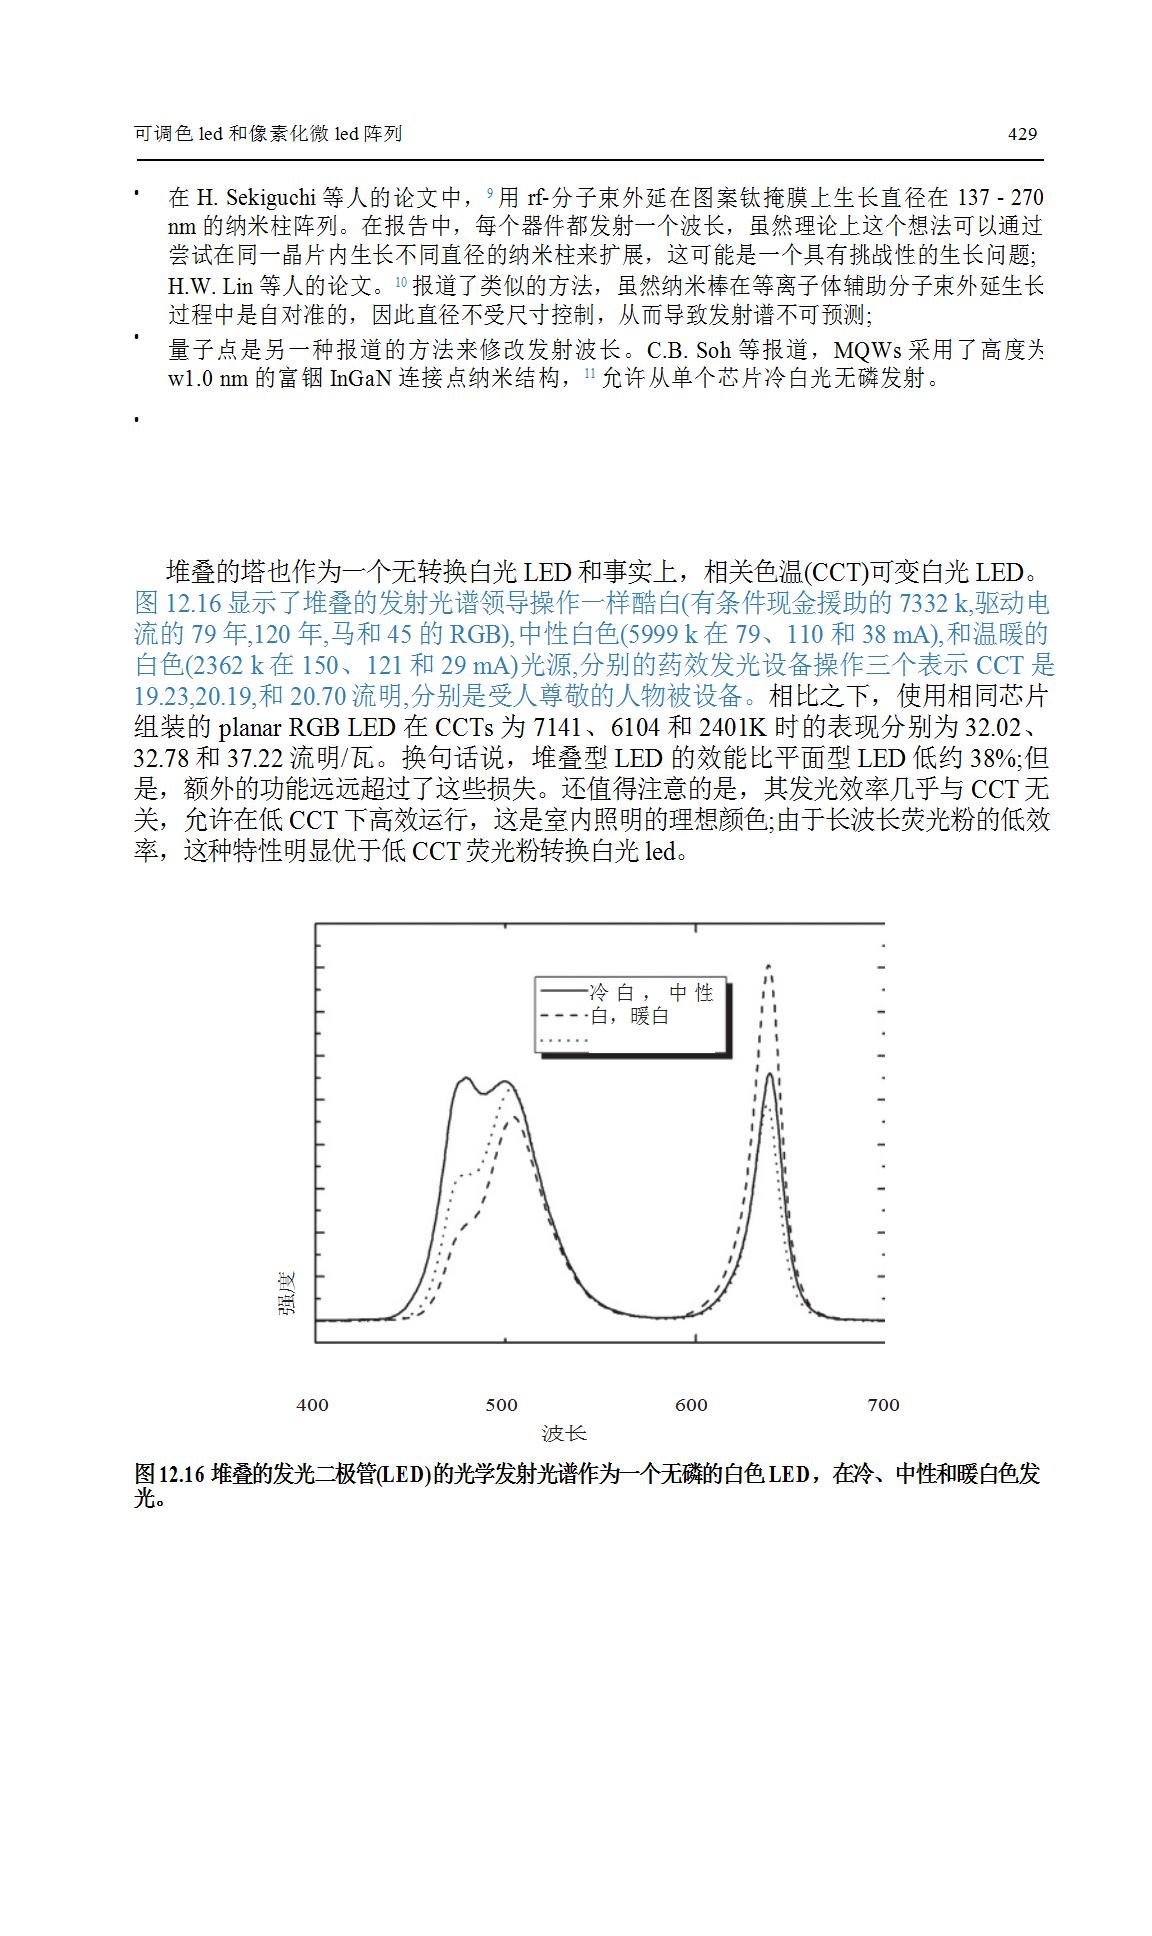 LED调色和像素化MicroLED阵列研究  第15张